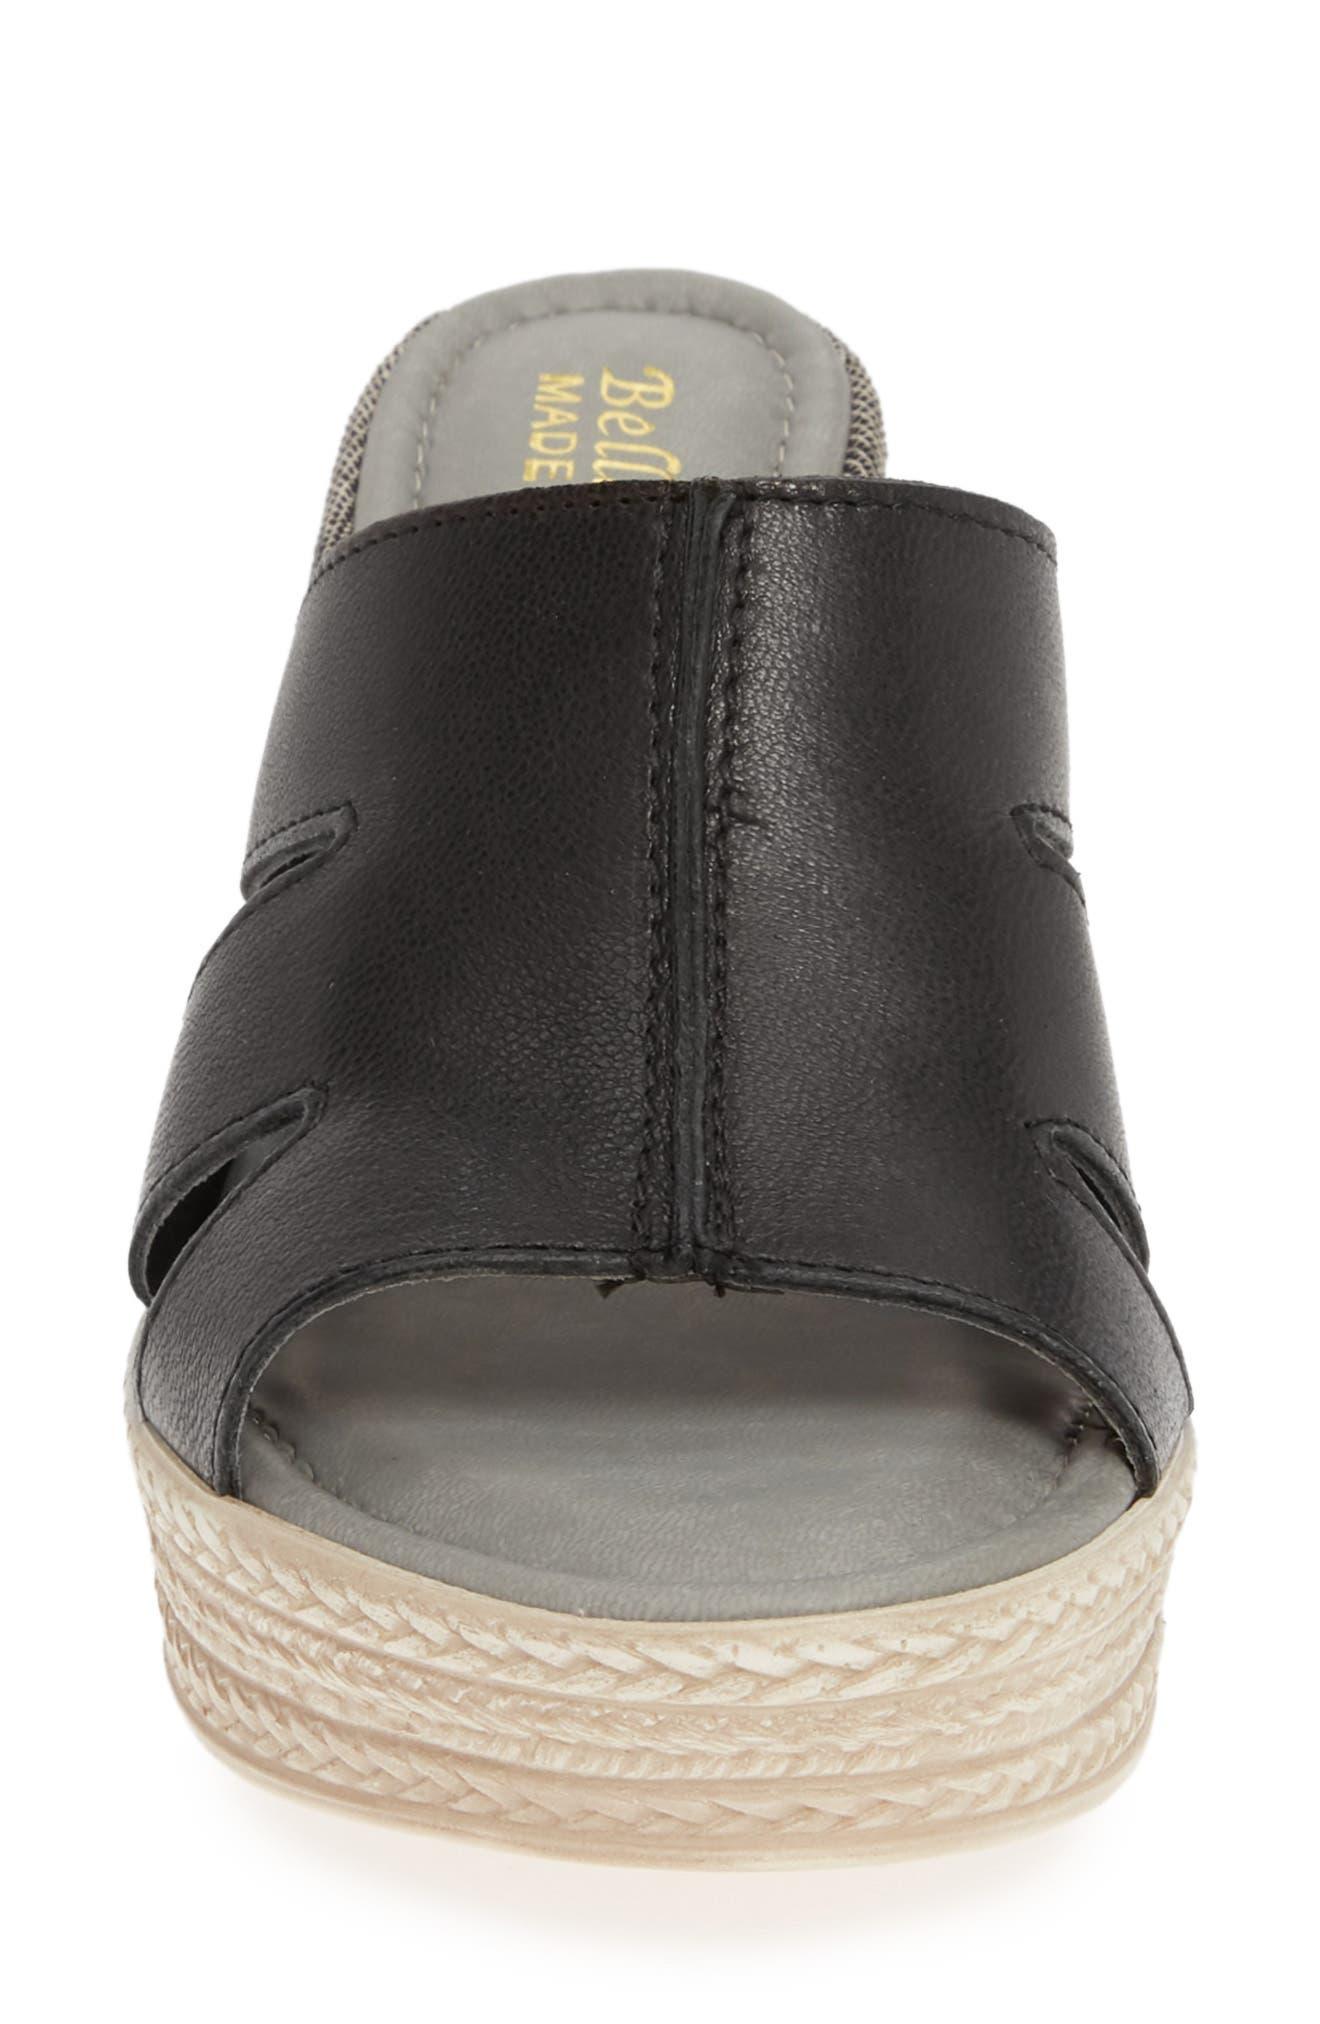 BELLA VITA, Rox Wedge Slide Sandal, Alternate thumbnail 4, color, BLACK ITALIAN LEATHER